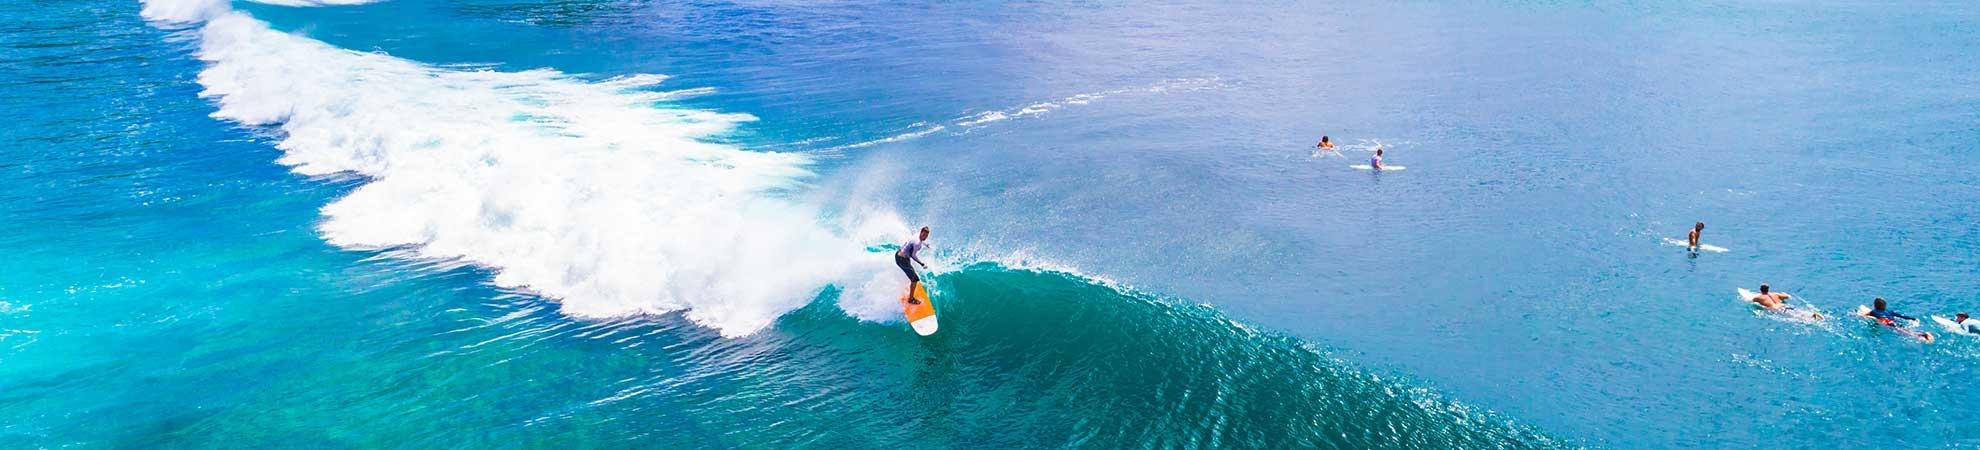 Visiter Bali